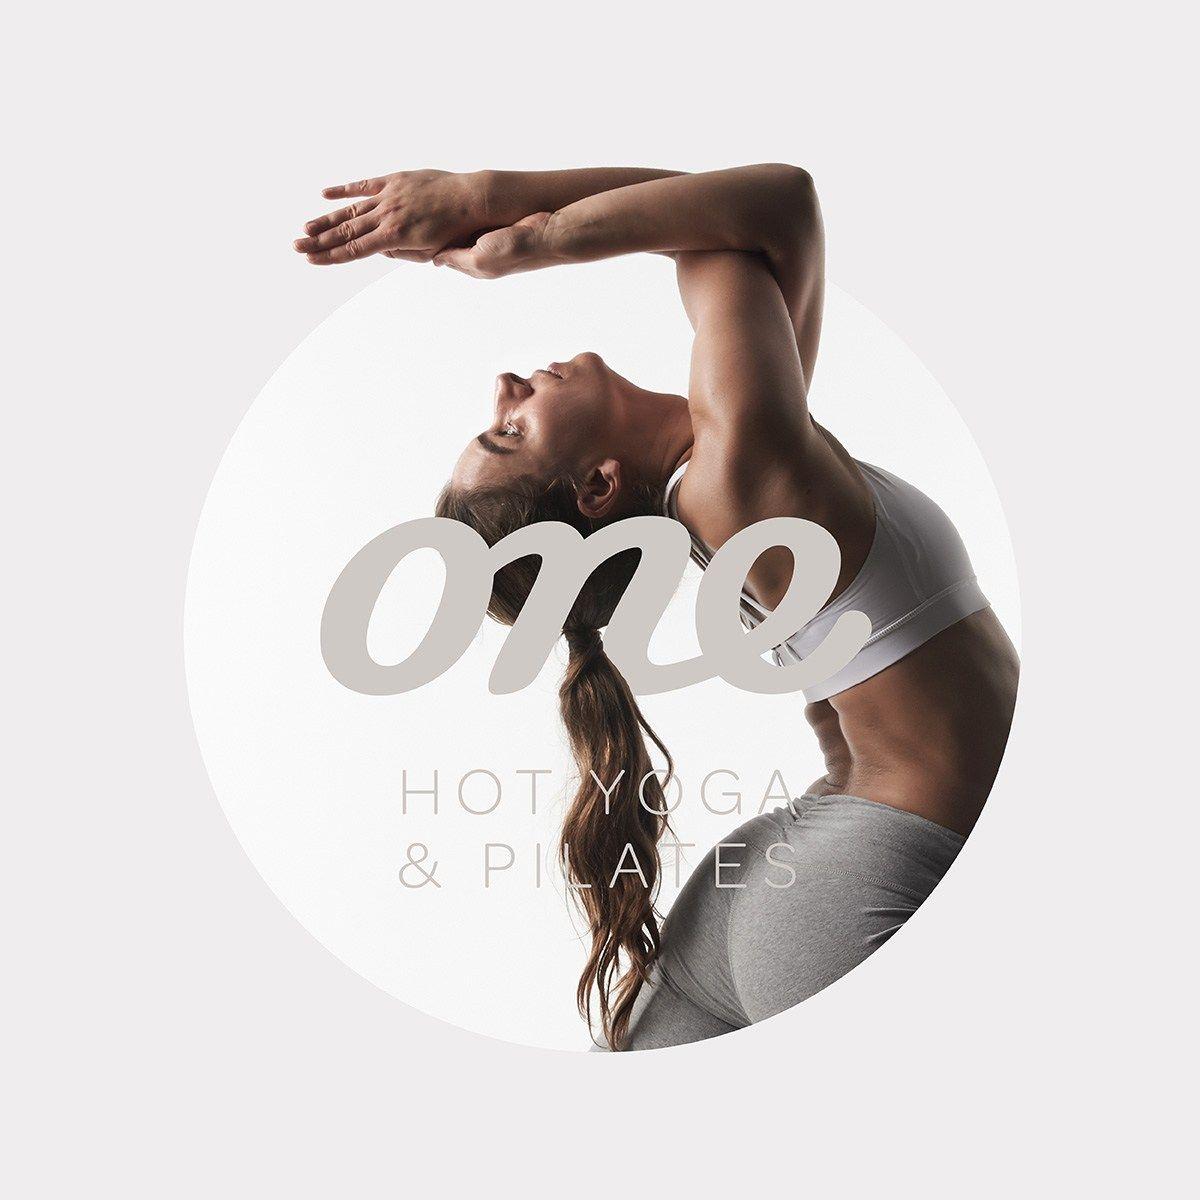 One hot yoga pilates south yarra melbourne australia